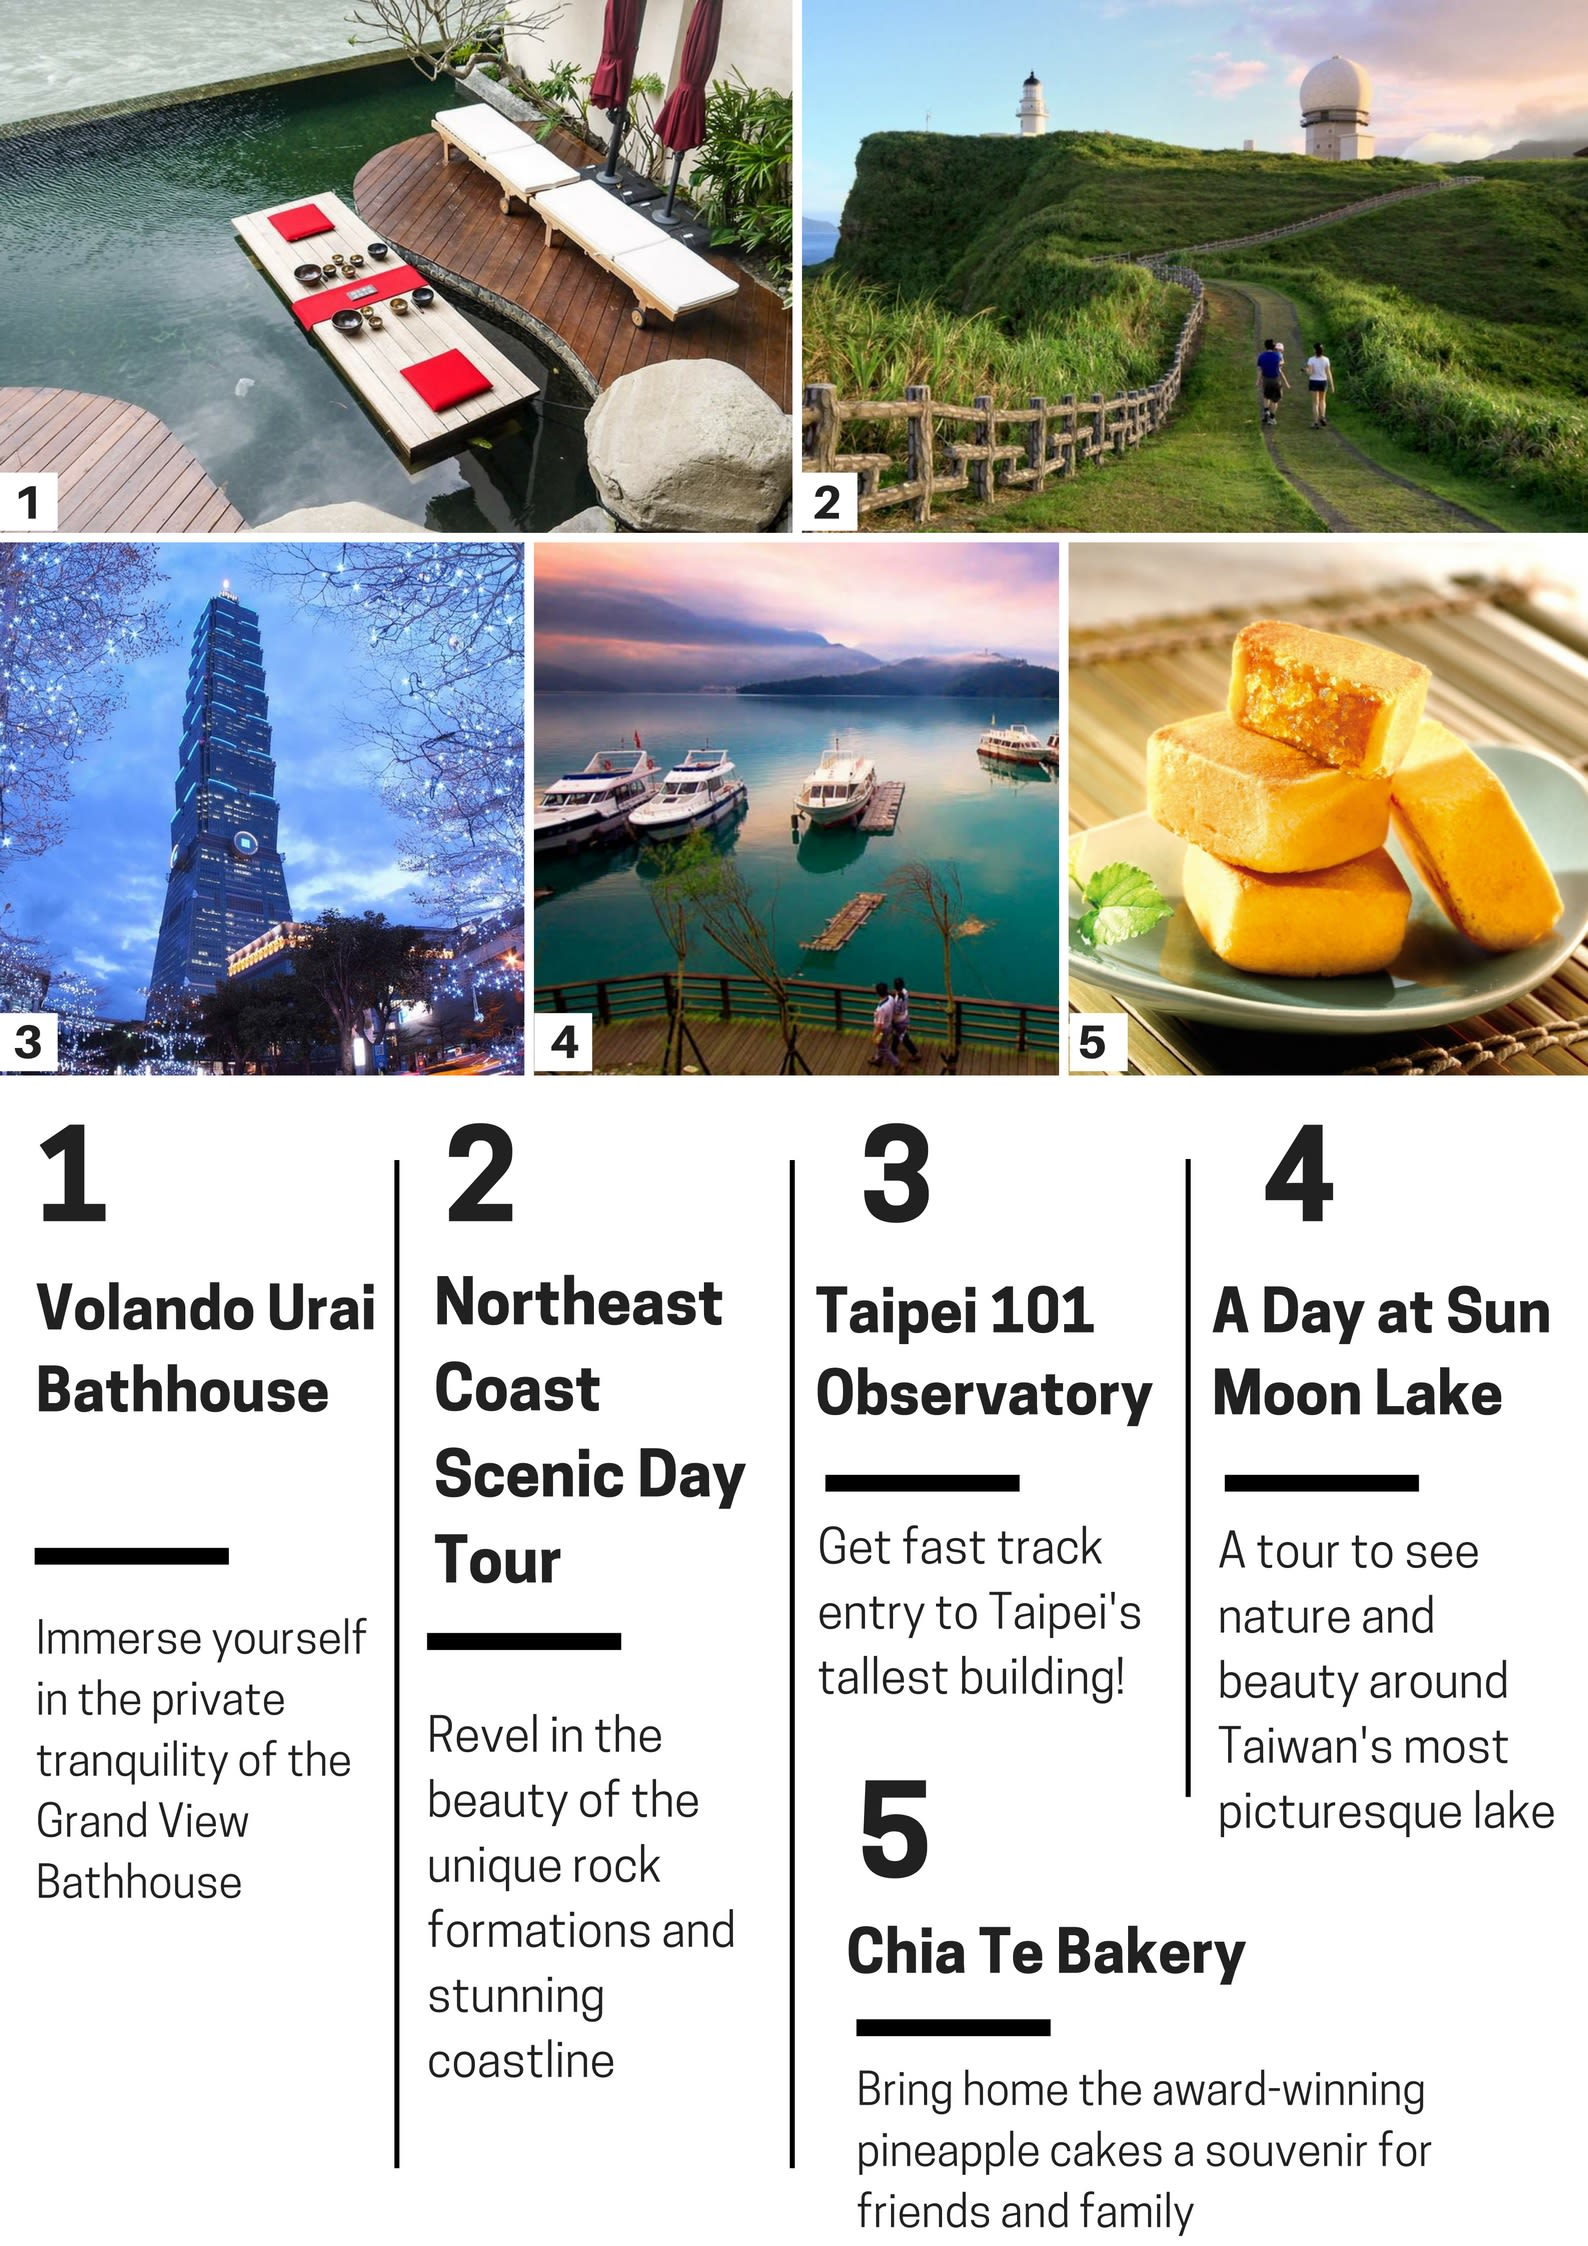 couple-travel-idea-taiwan